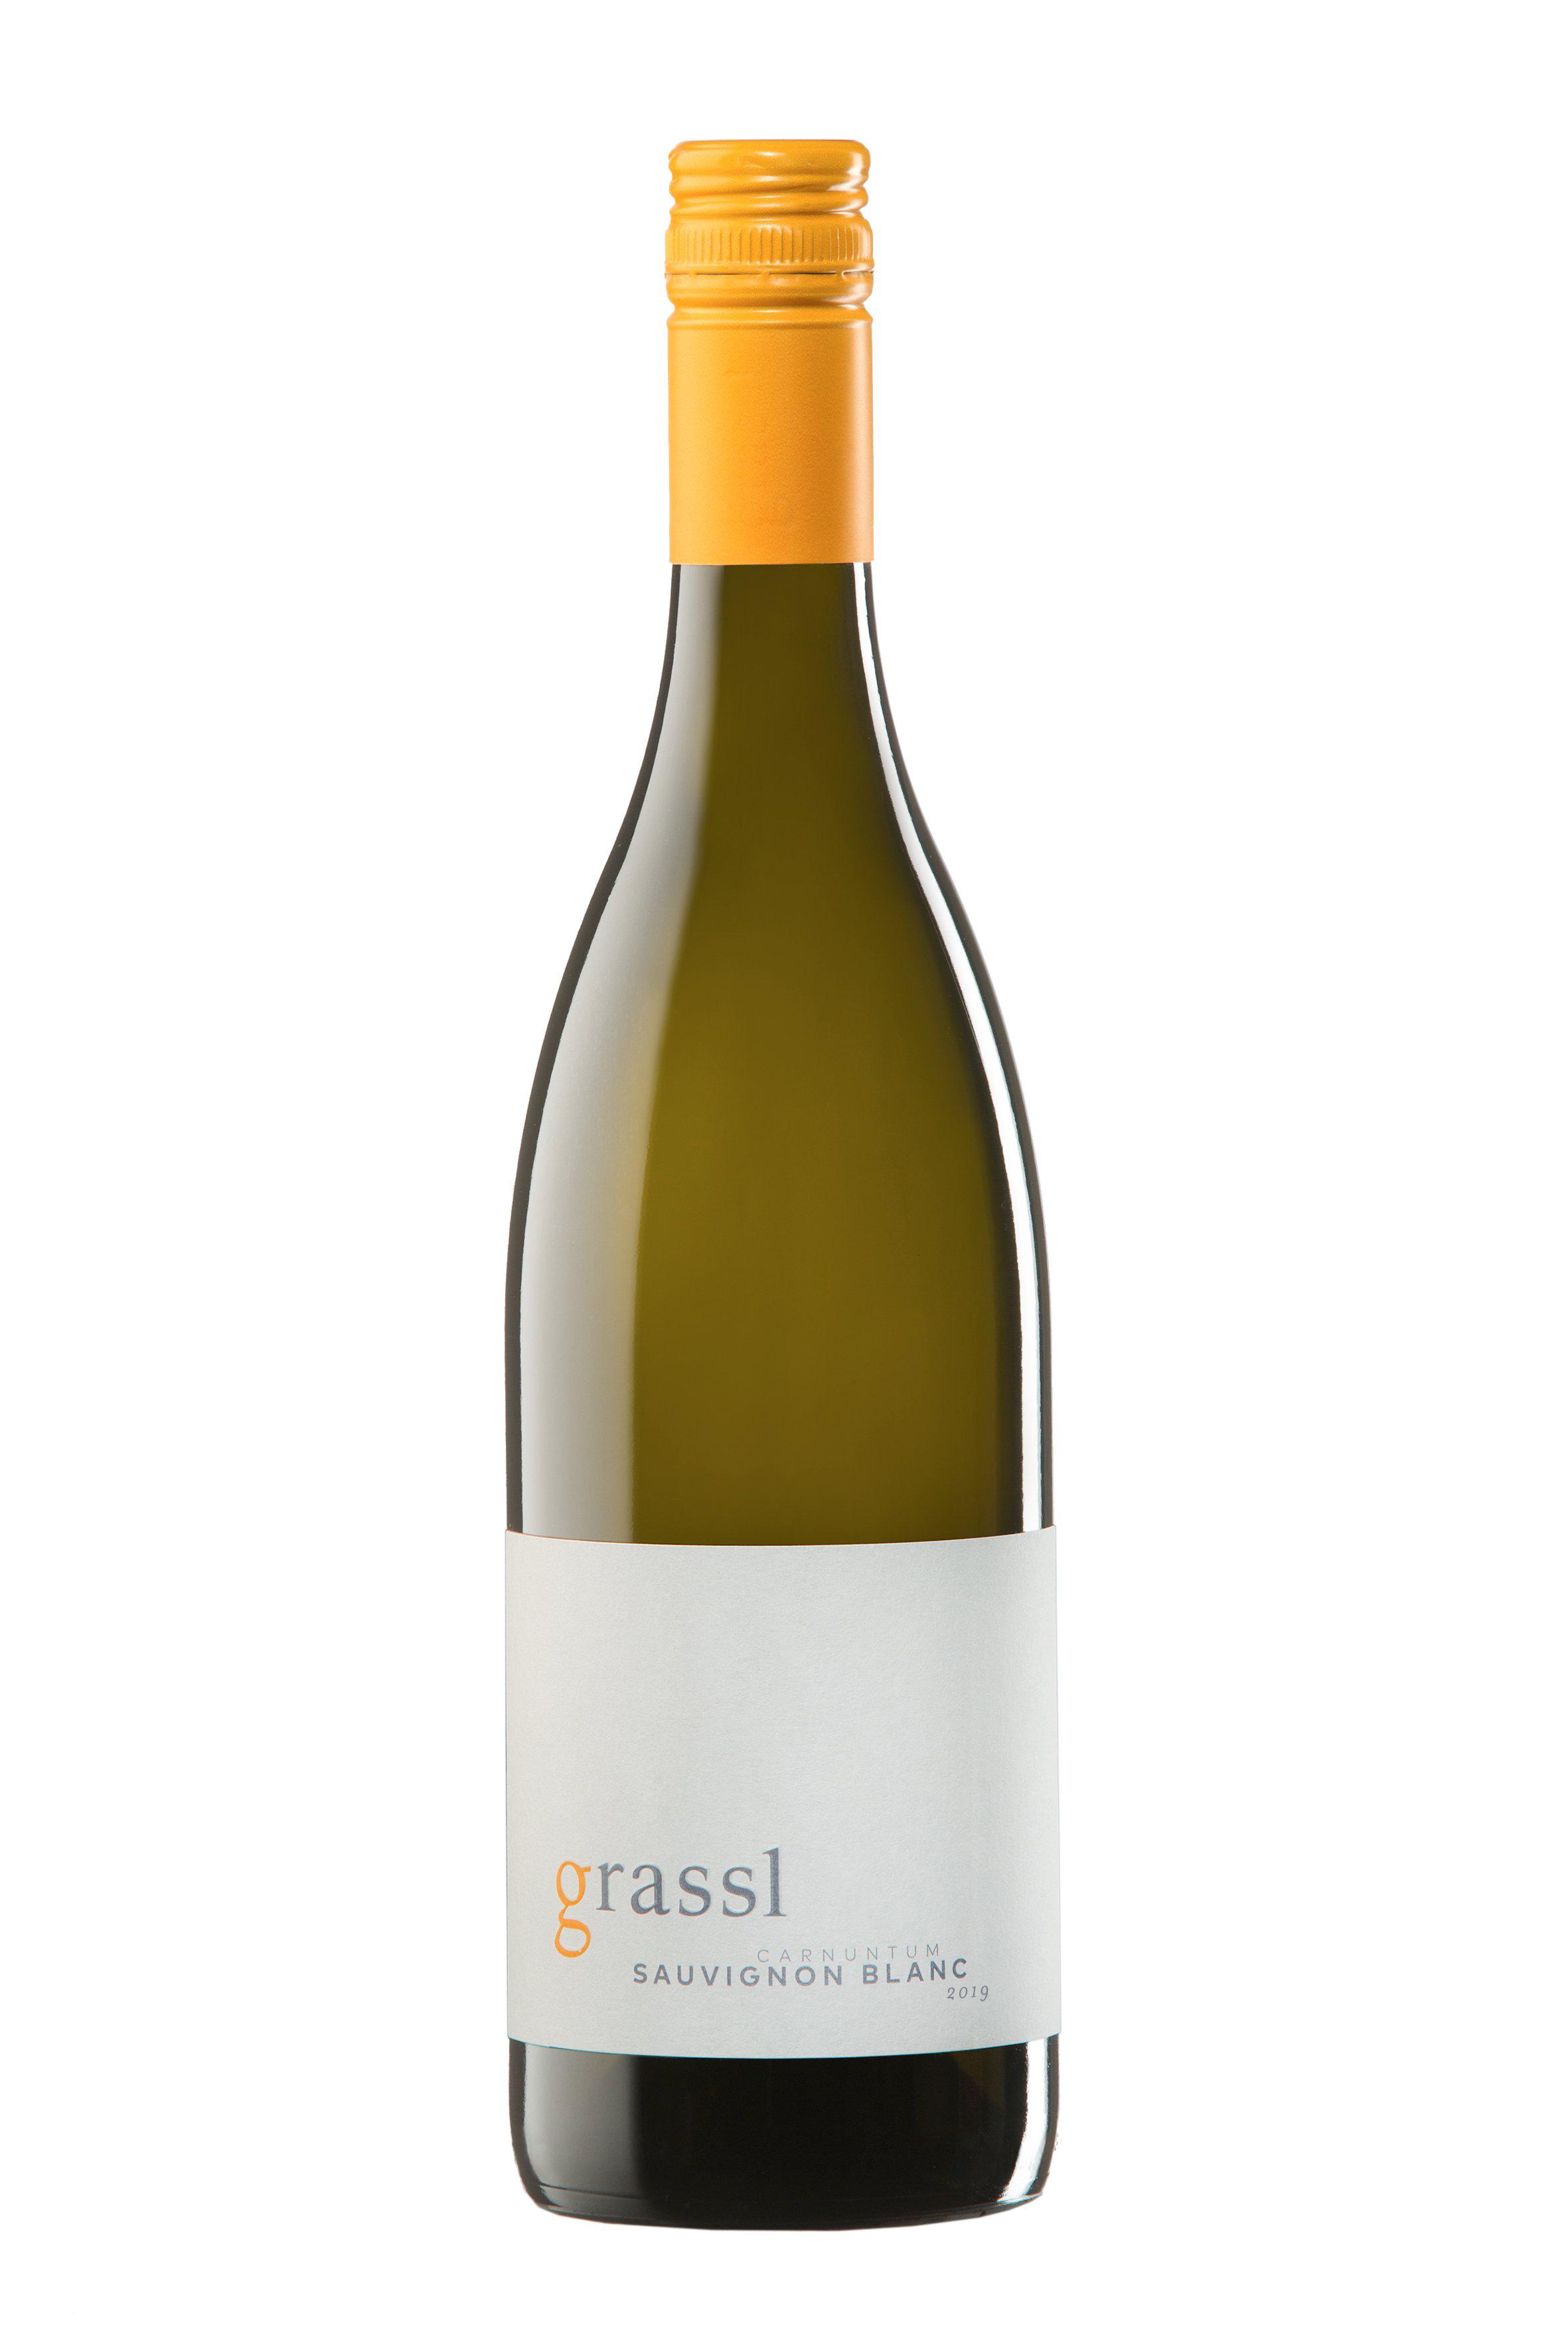 Philipp Grassl Göttlesbrunnn Sauvignon Blanc 2019